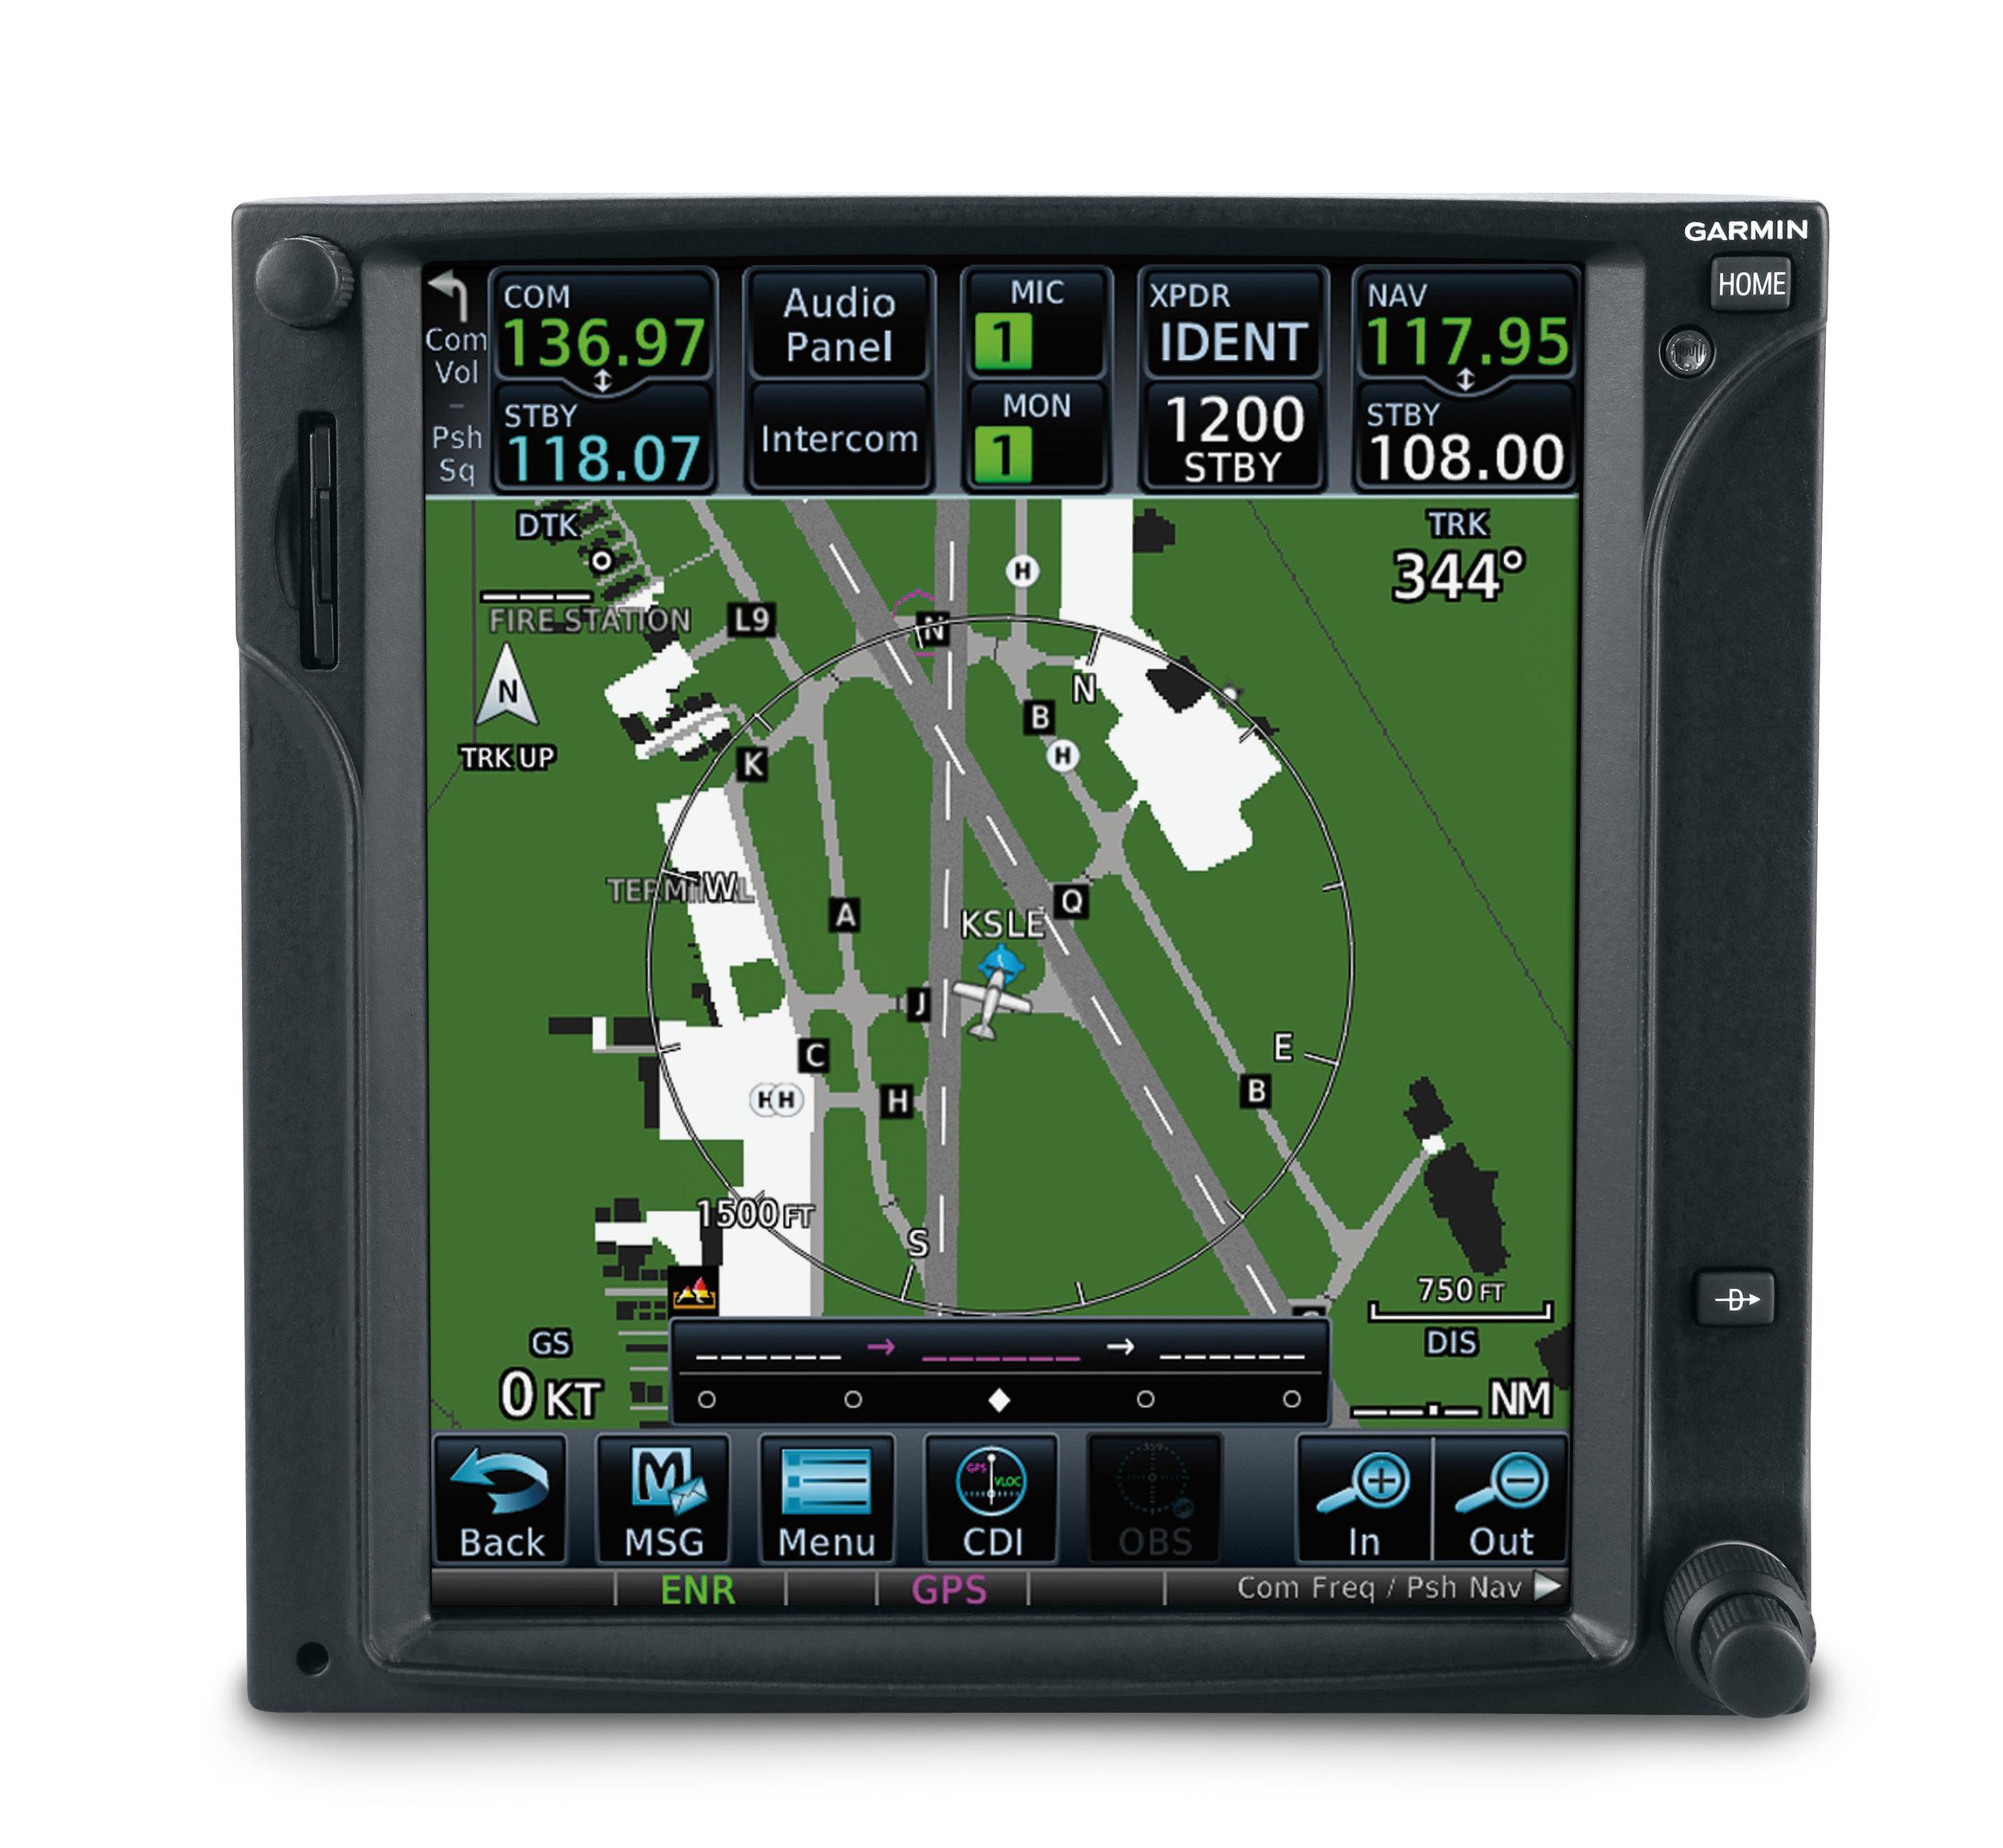 GTN™ 750 - GPS/COMM/NAV — Southern Sailplanes on